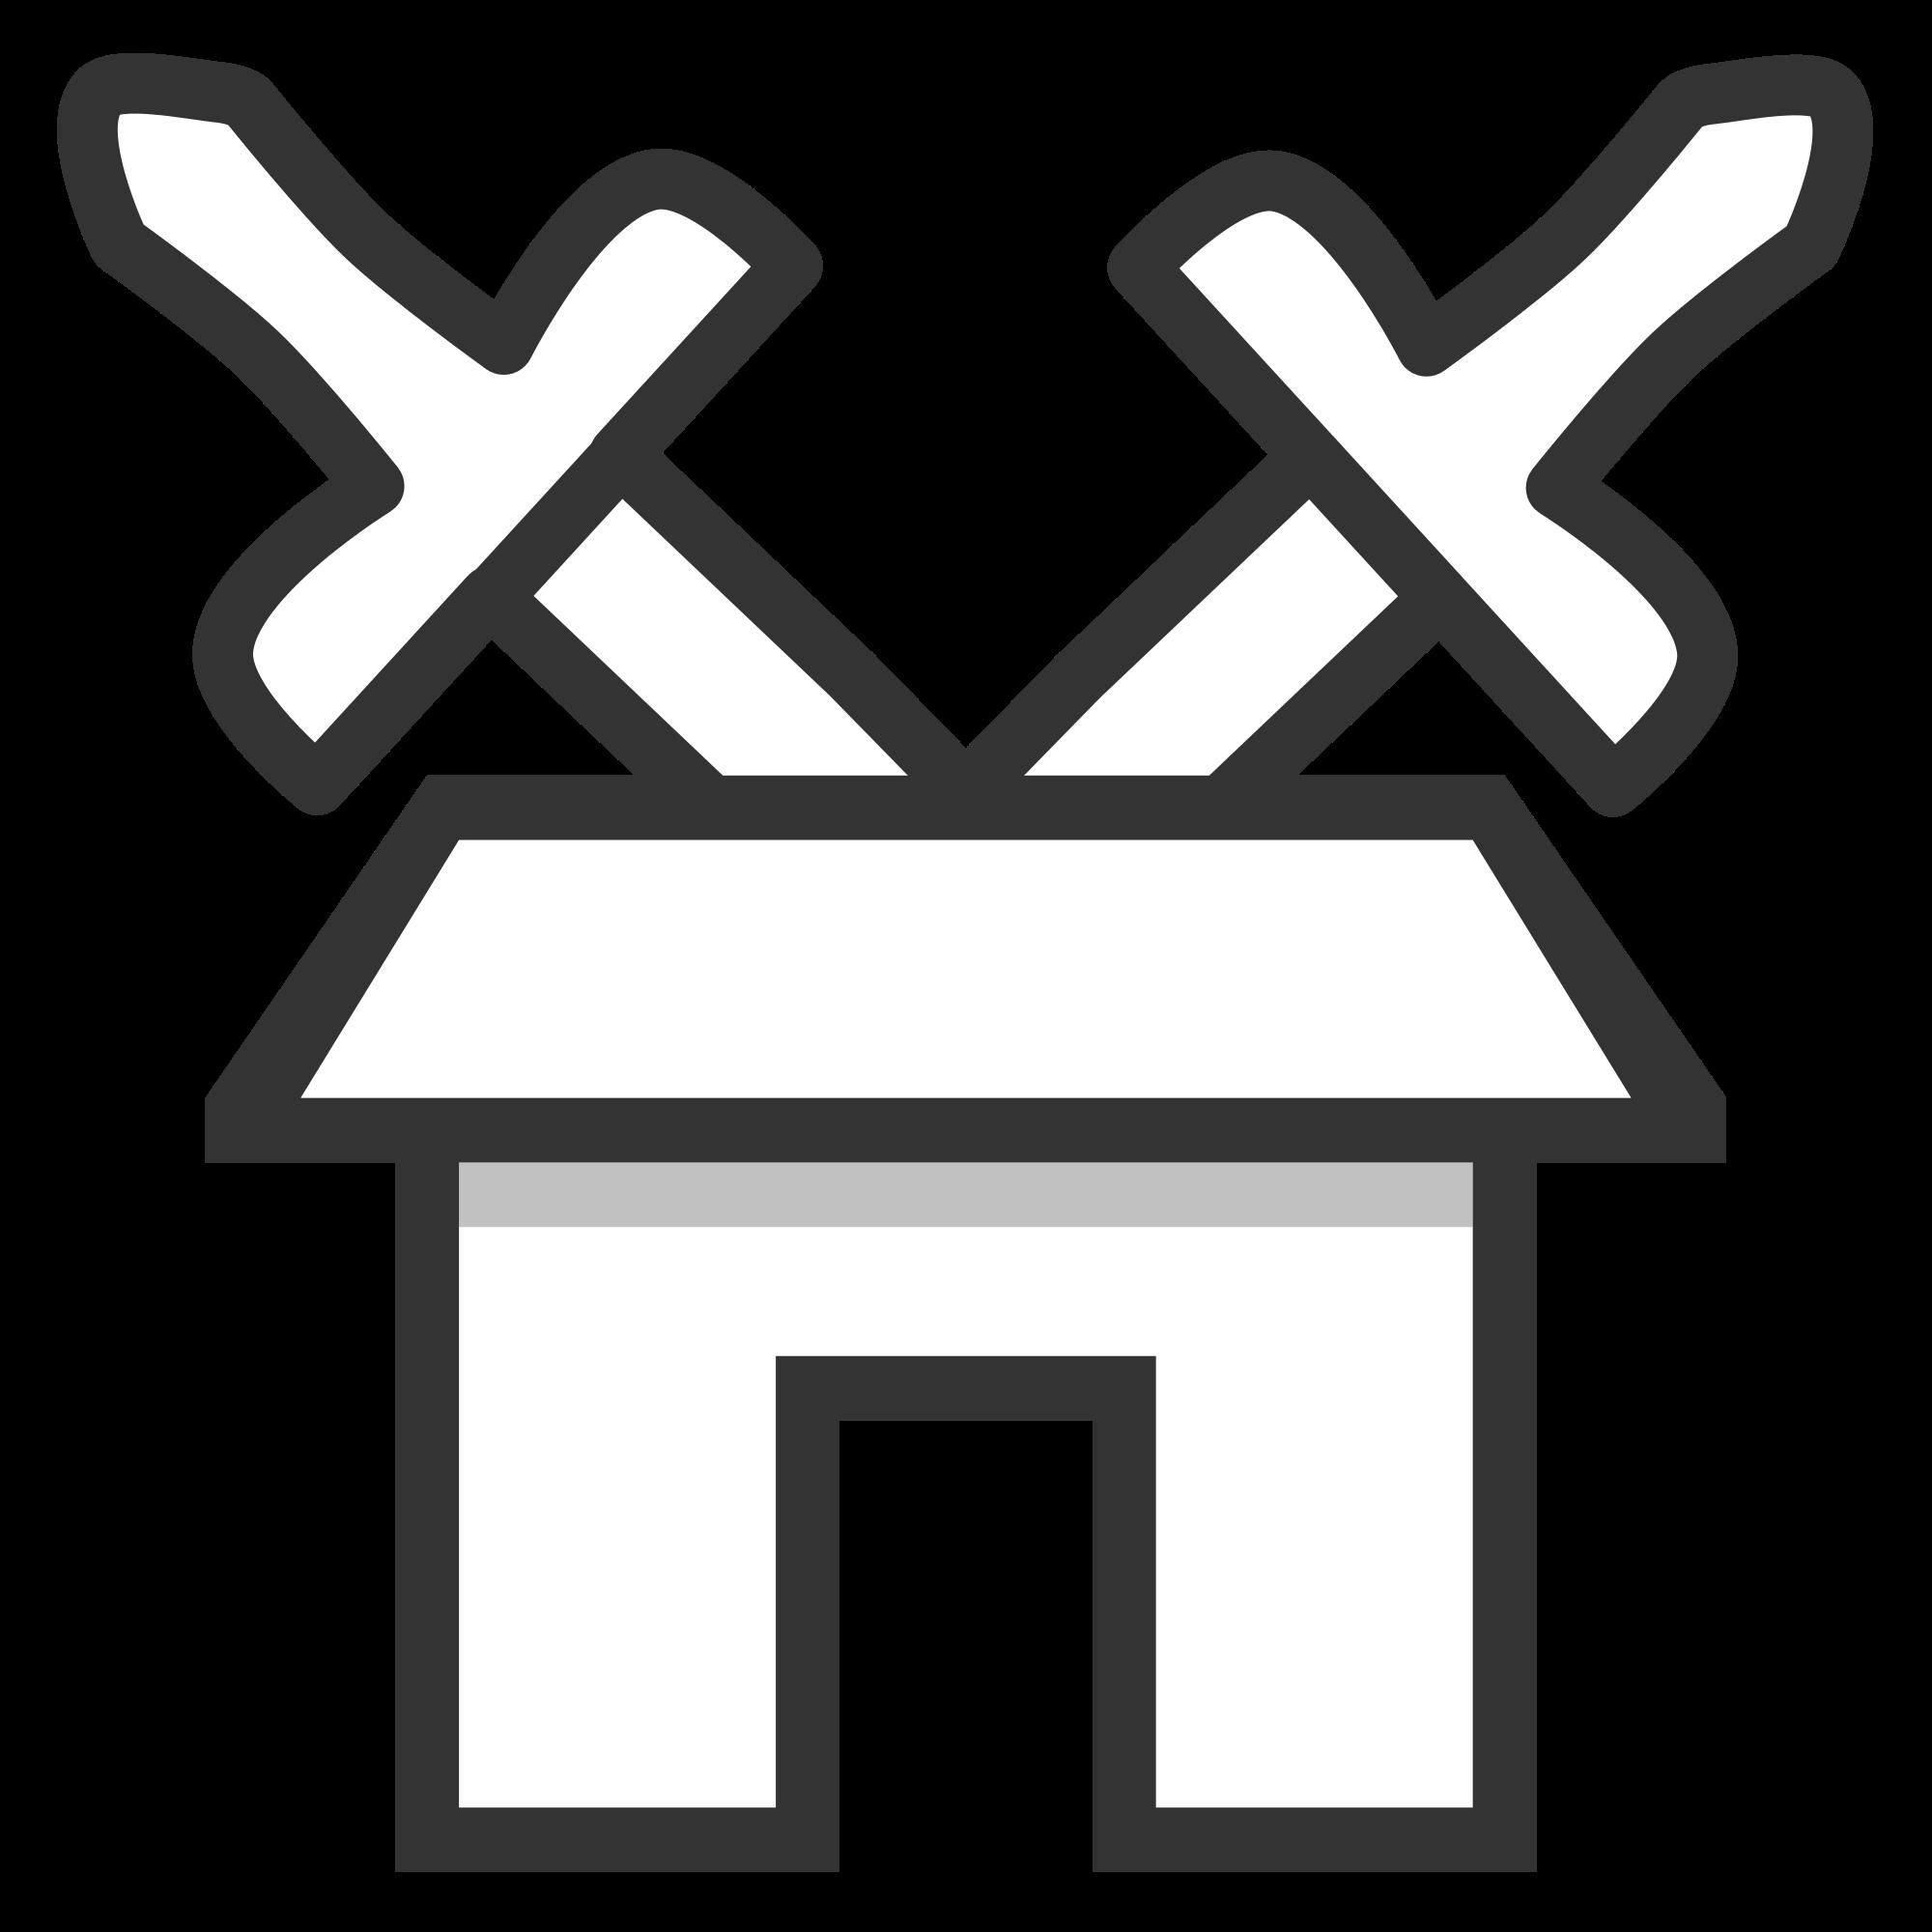 vector free stock svg opacity thumbnail #104328615